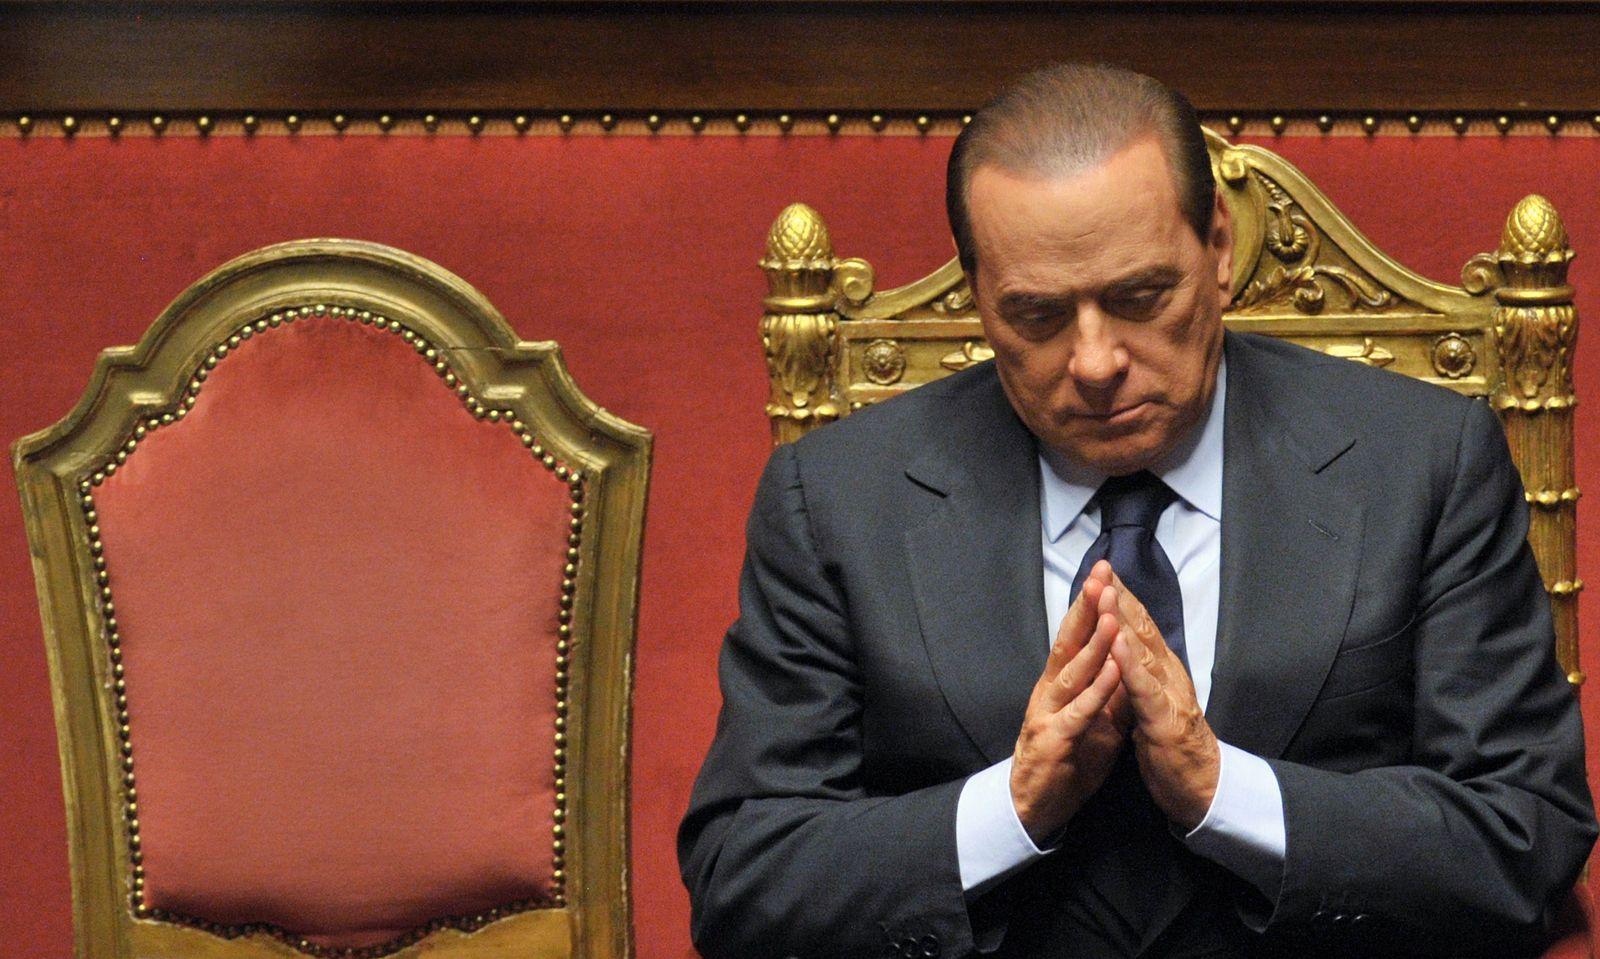 ITALY-POLITICS-BERLUSCONI-FILES